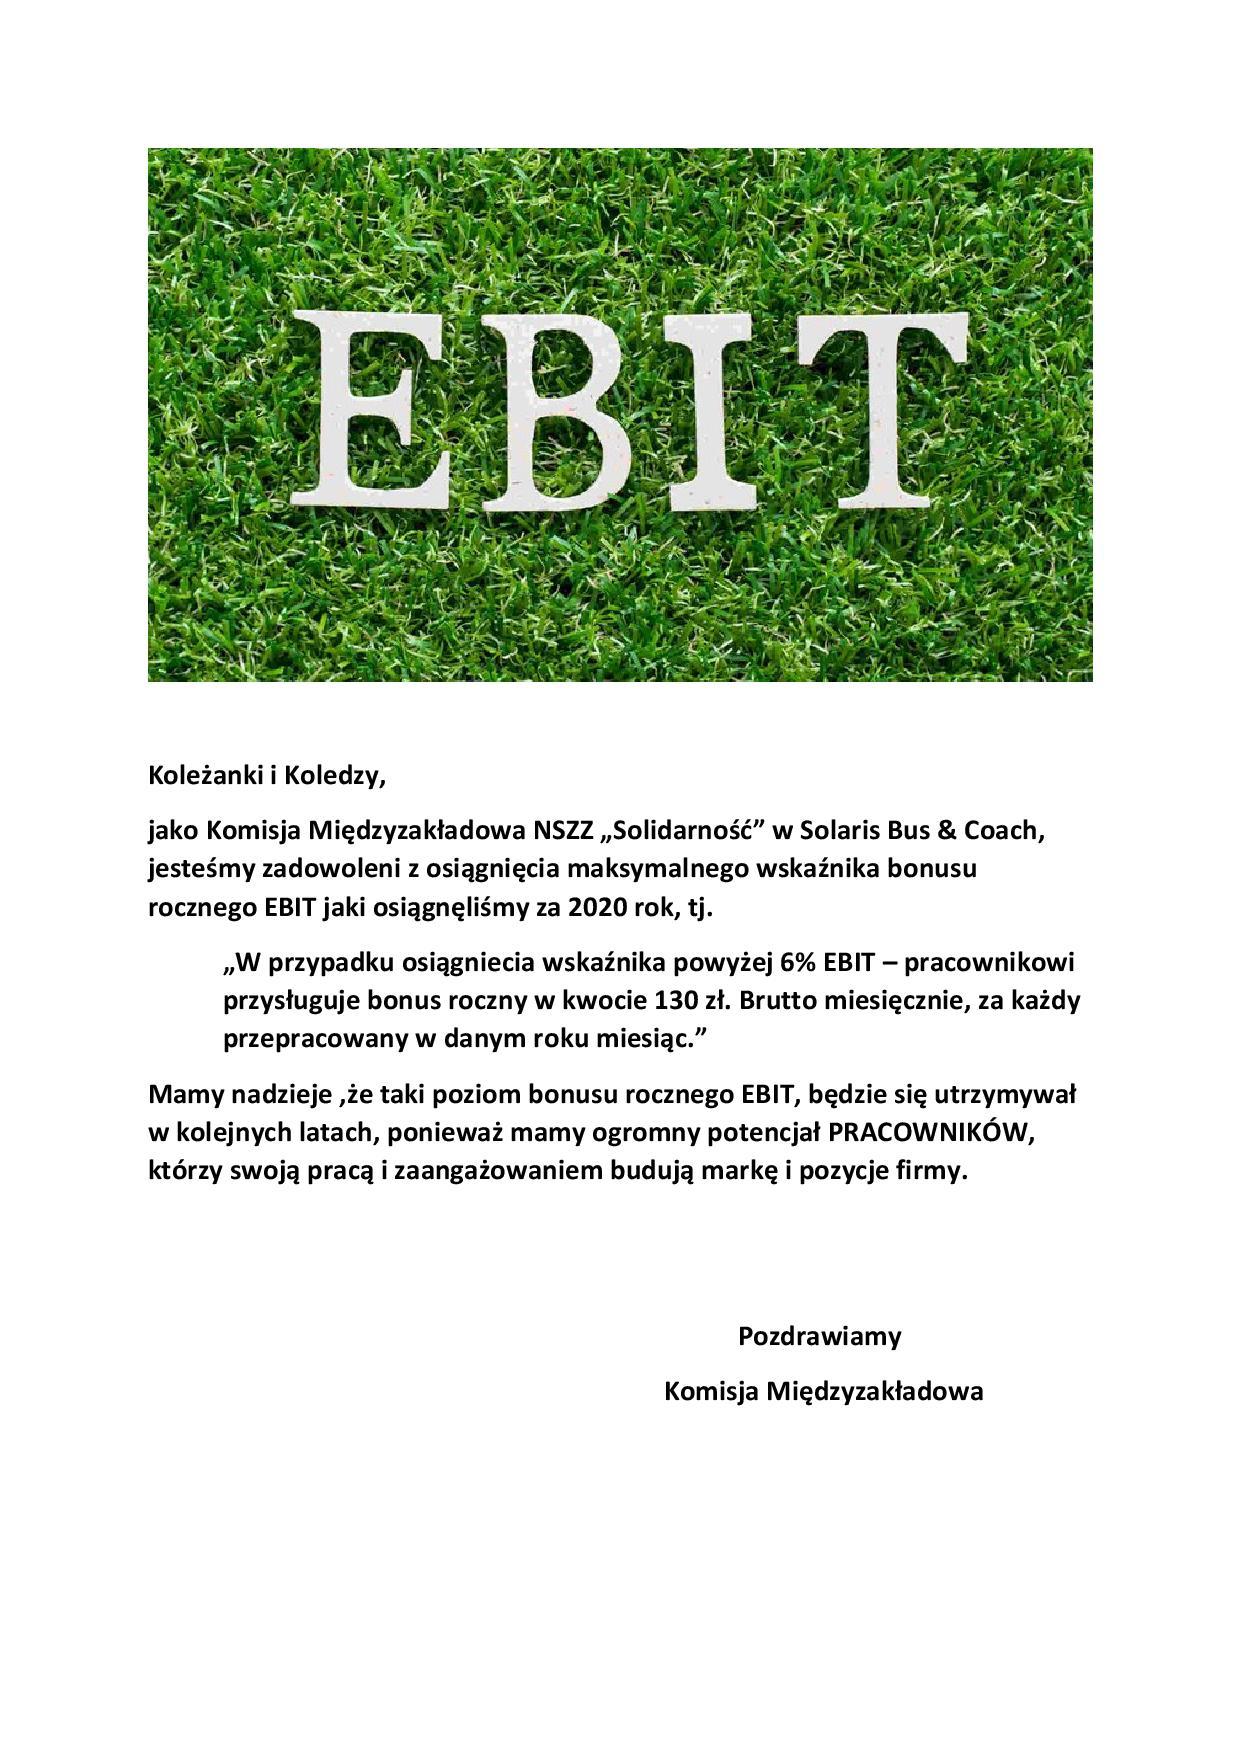 EBIT 2020